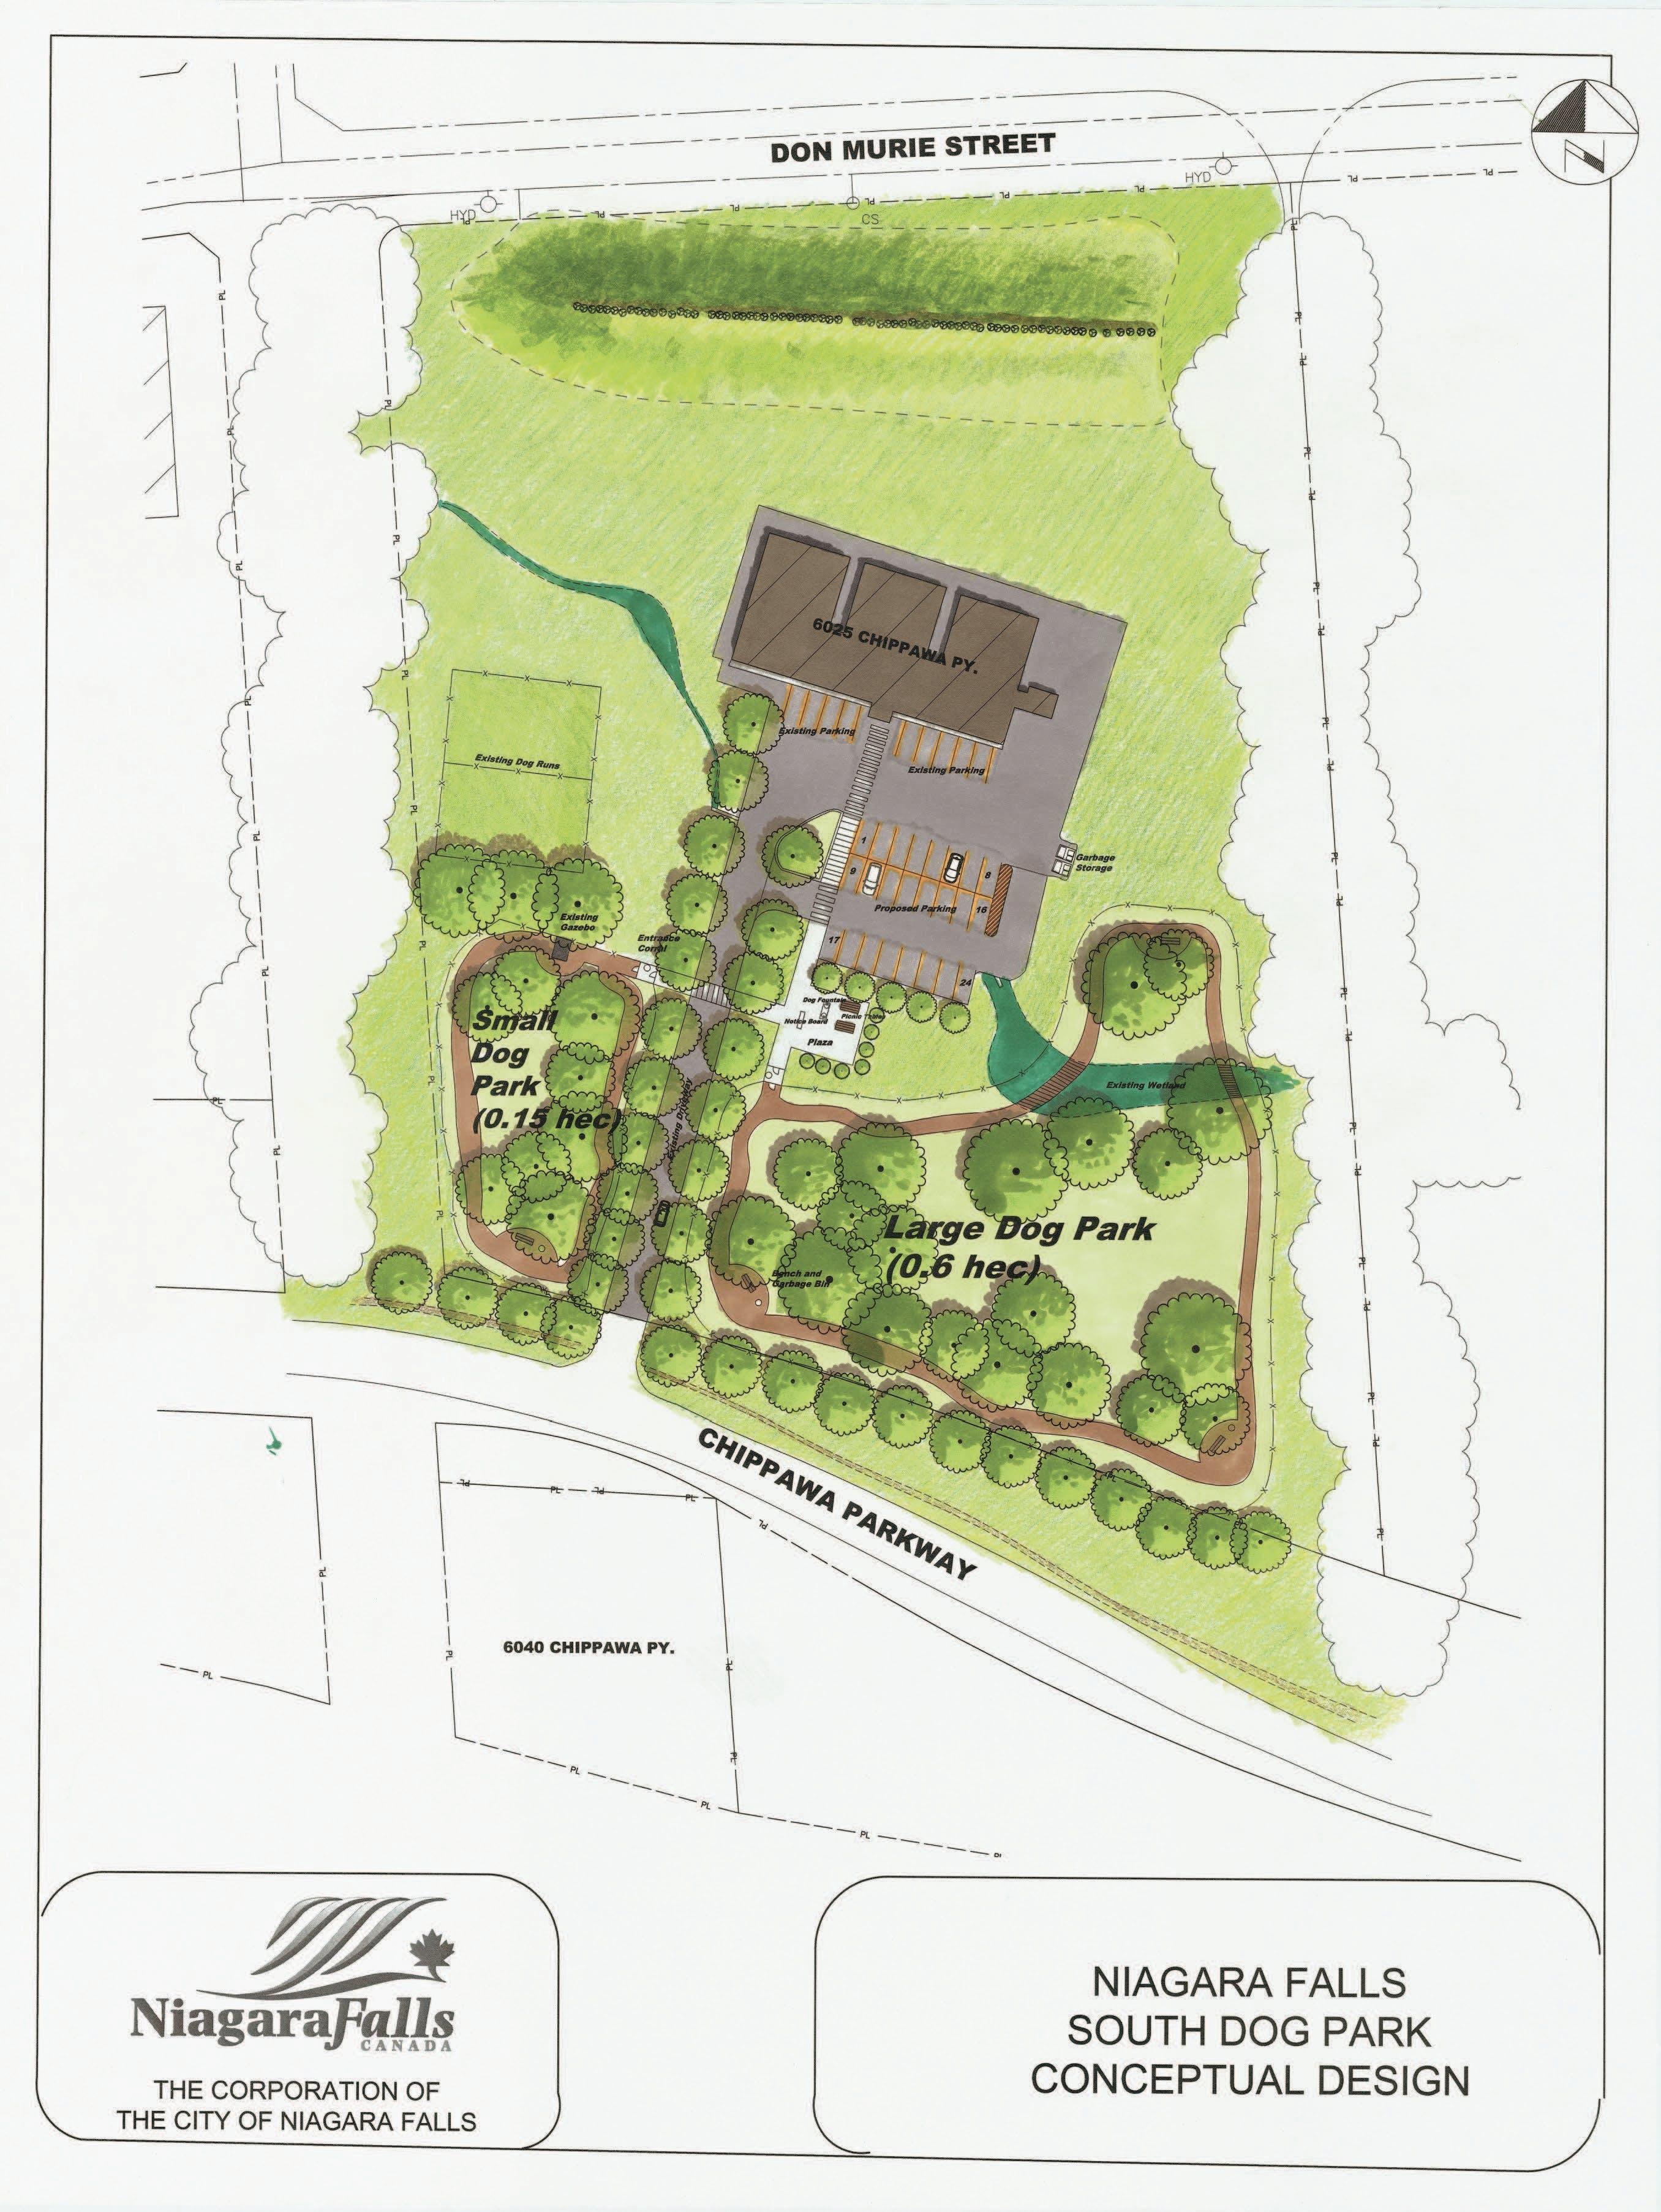 Niagara Falls South Dog Park Conceptual Design